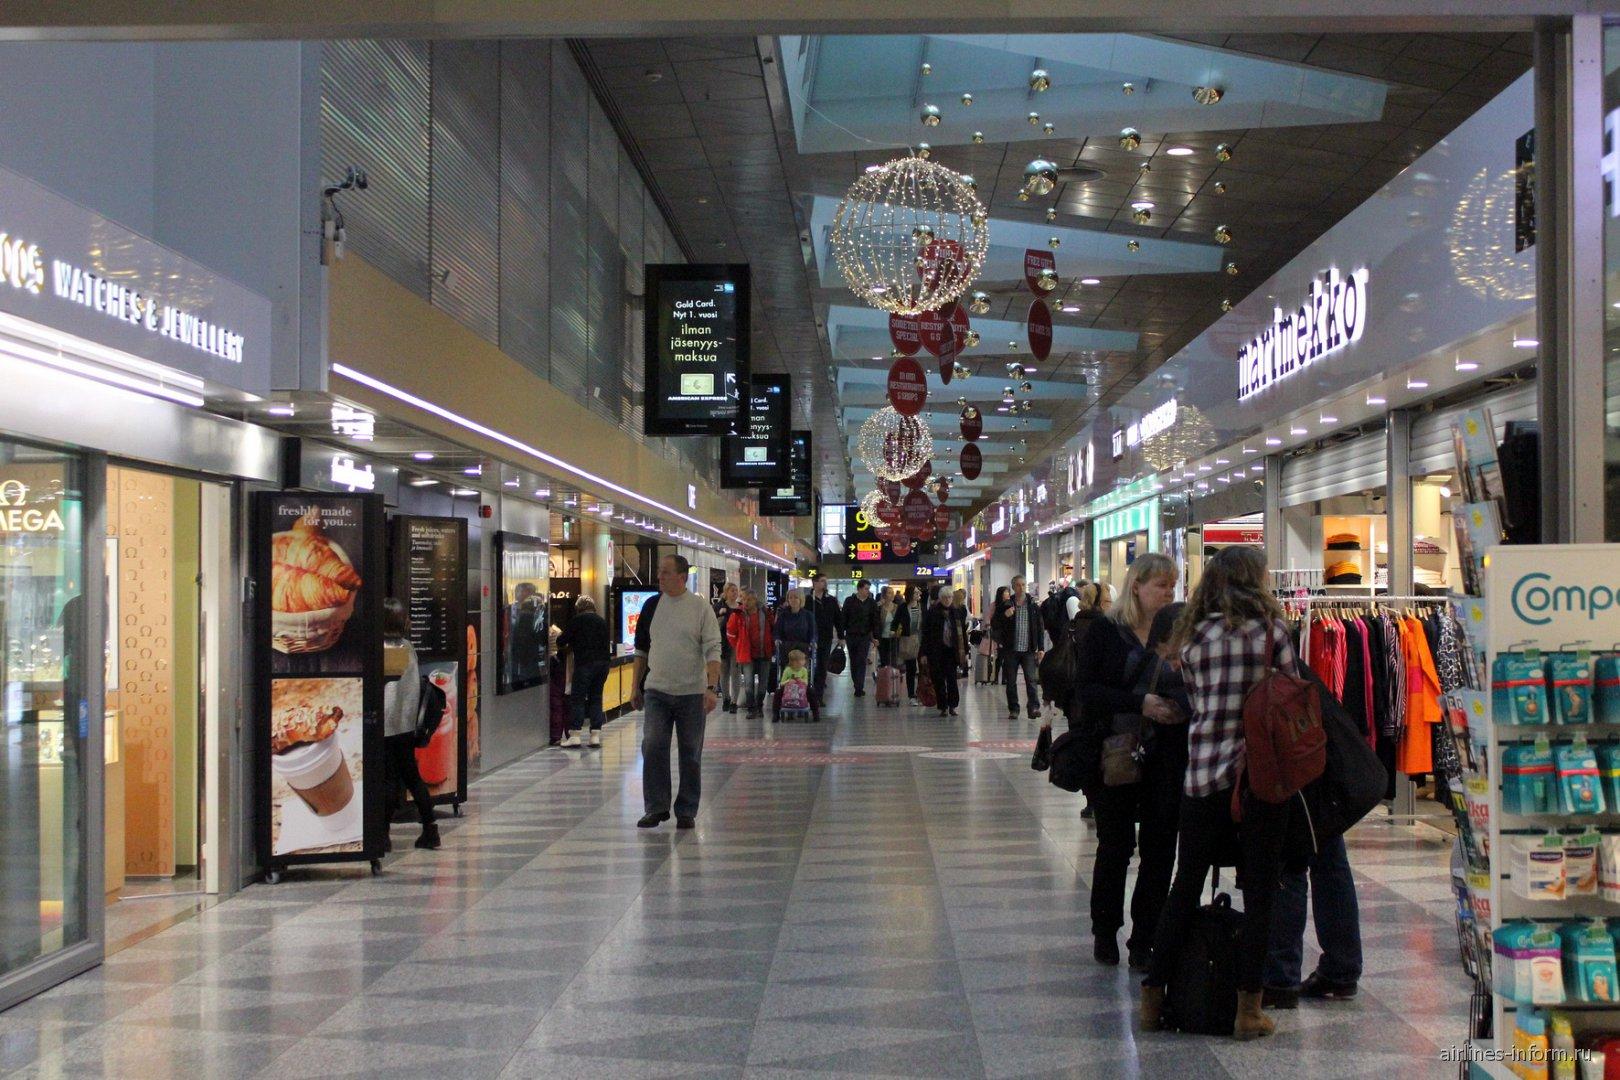 Галерея магазинов в терминале 2 аэропорта Хельсинки Вантаа